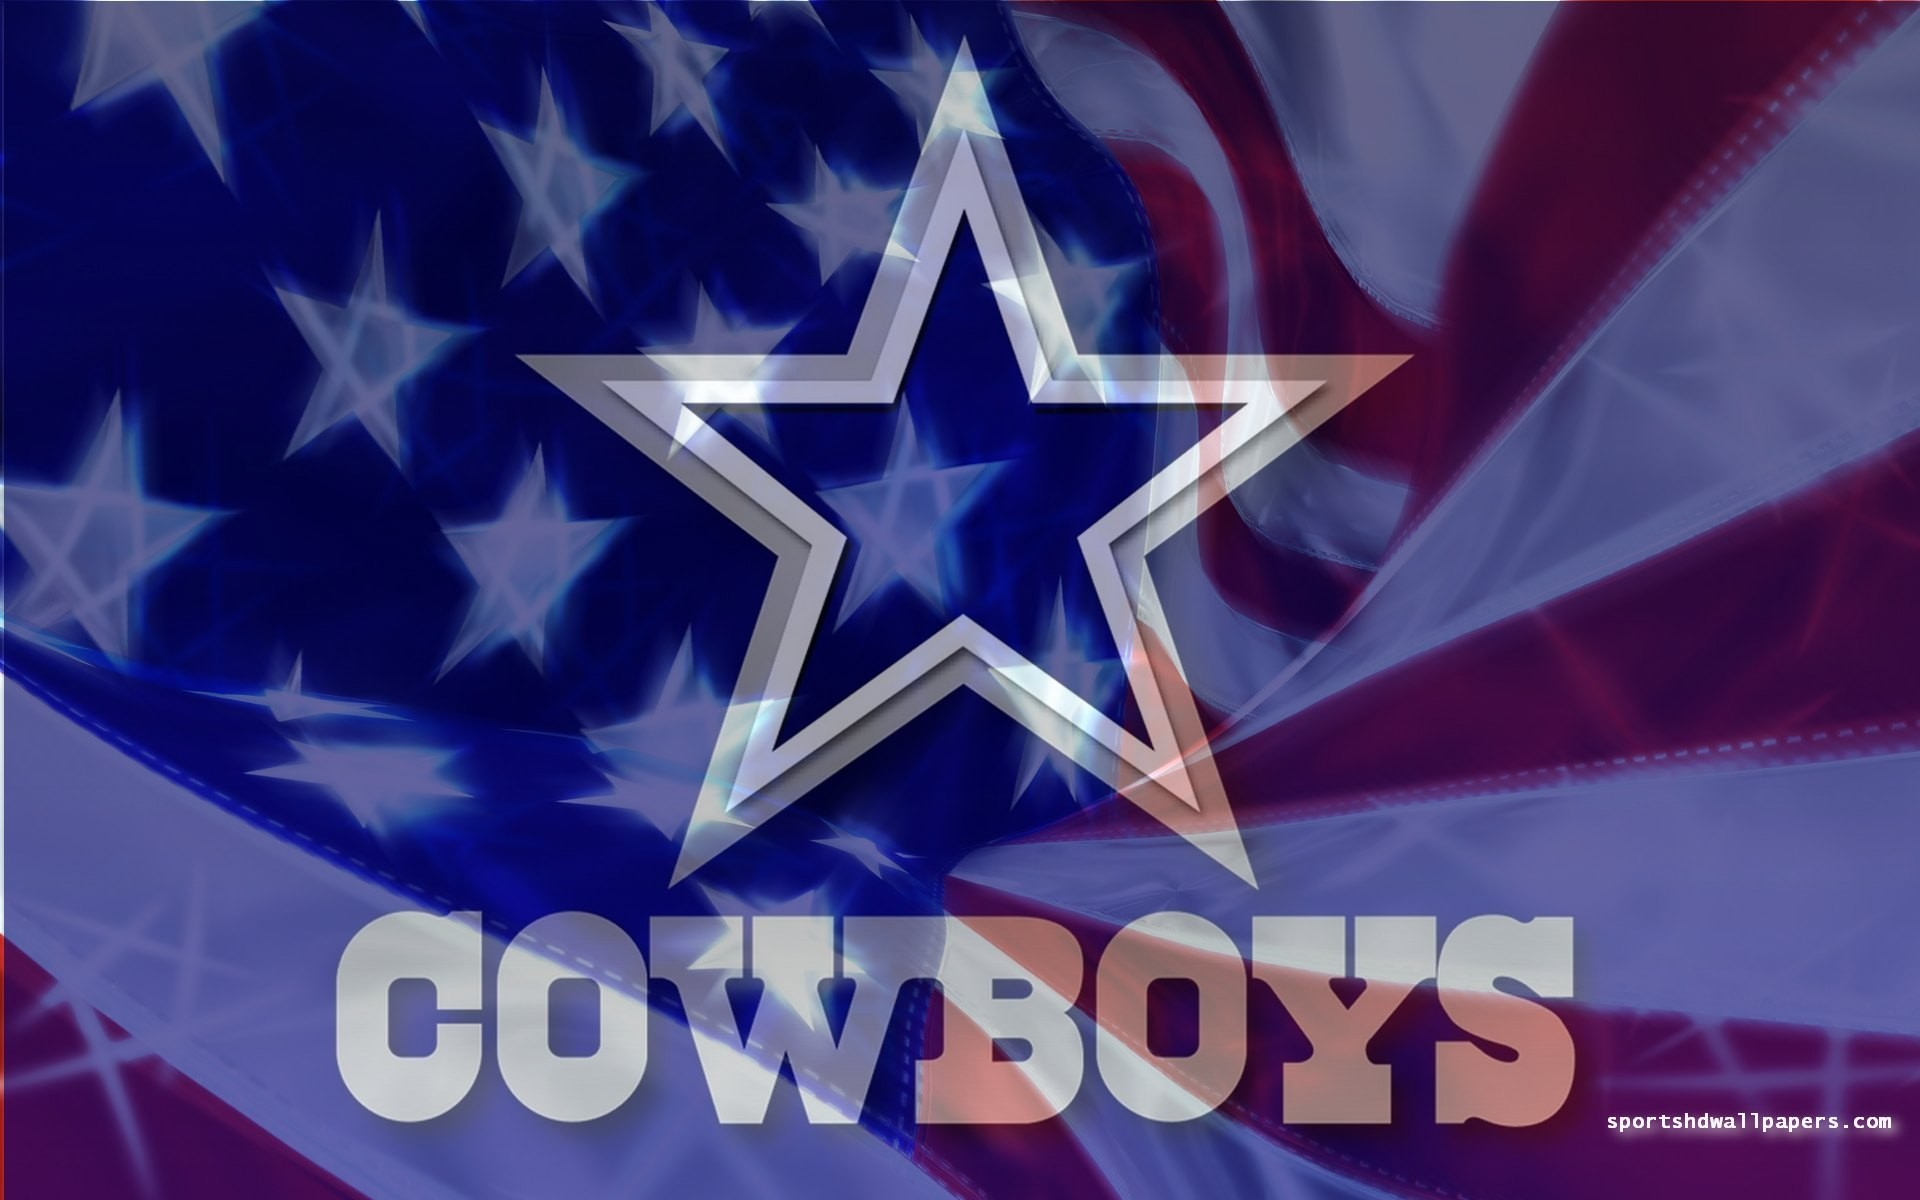 cowboys logo wallpaper 19 nfl dallas cowboys stripes logo desktop